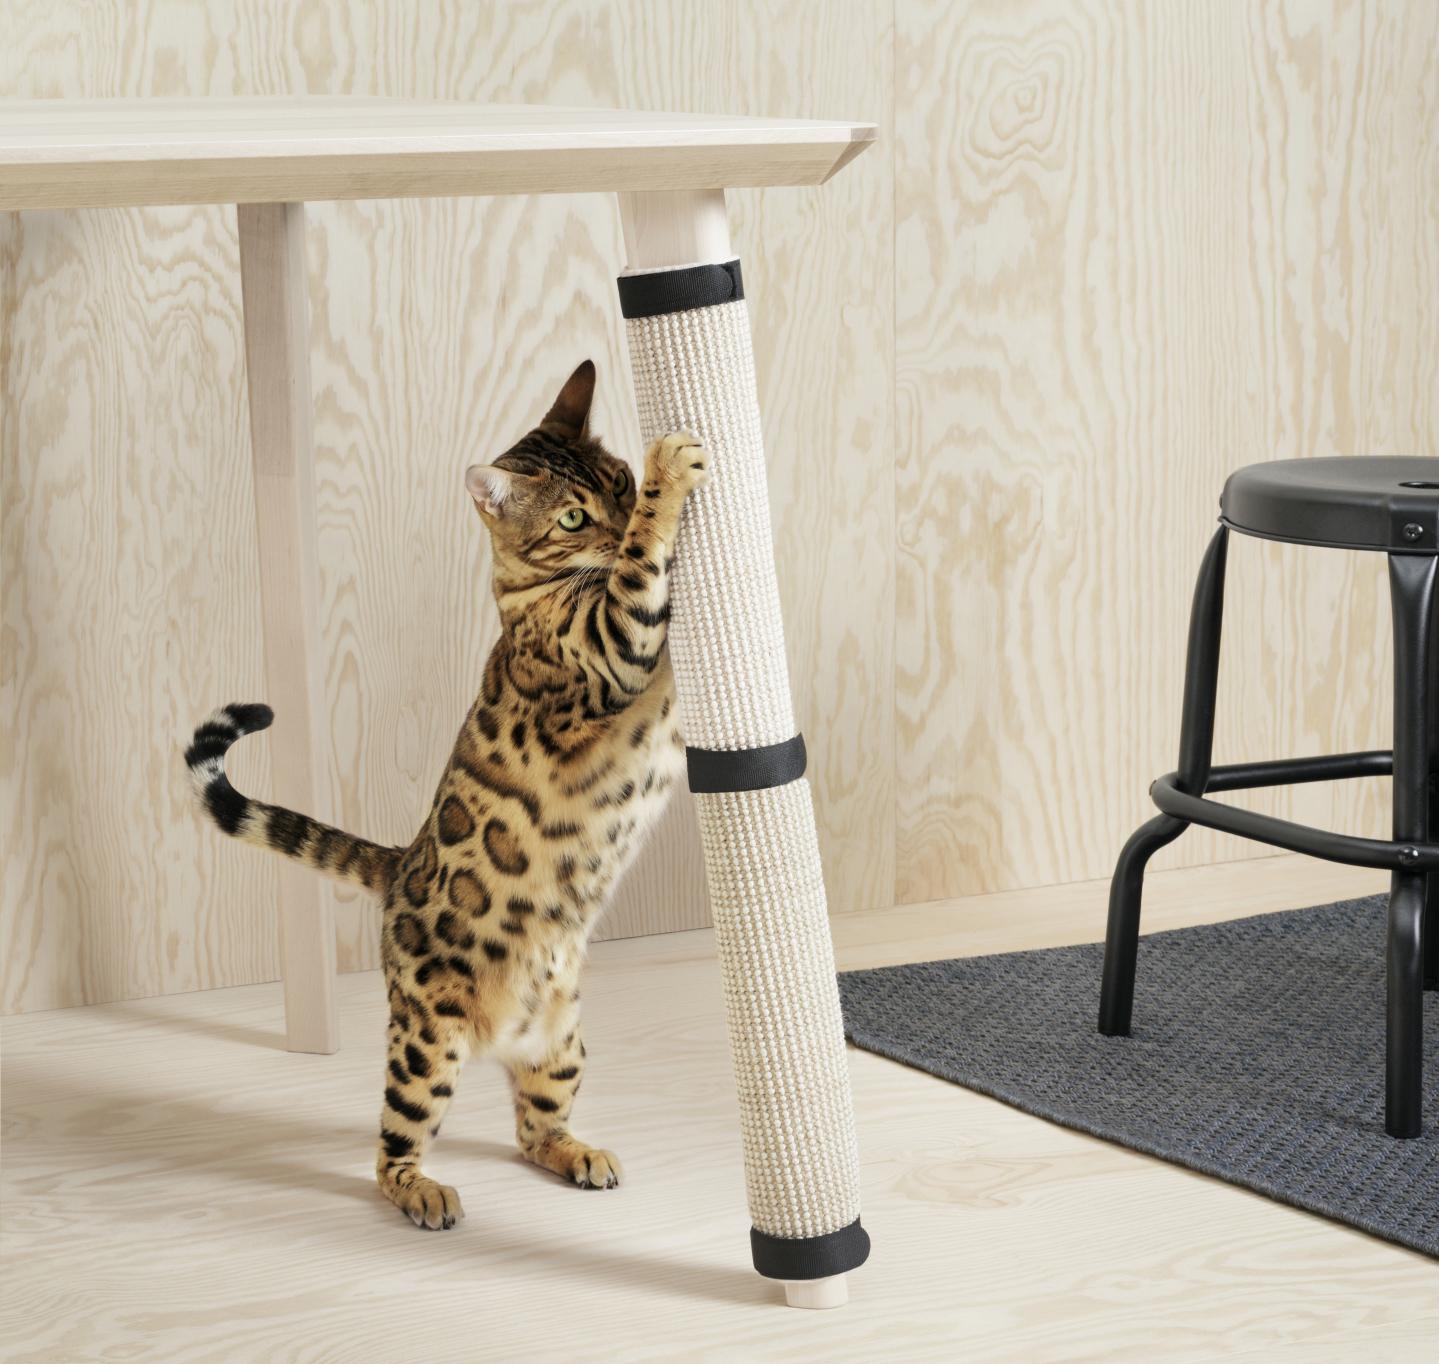 rascador ara gatos Ikea Ludwig